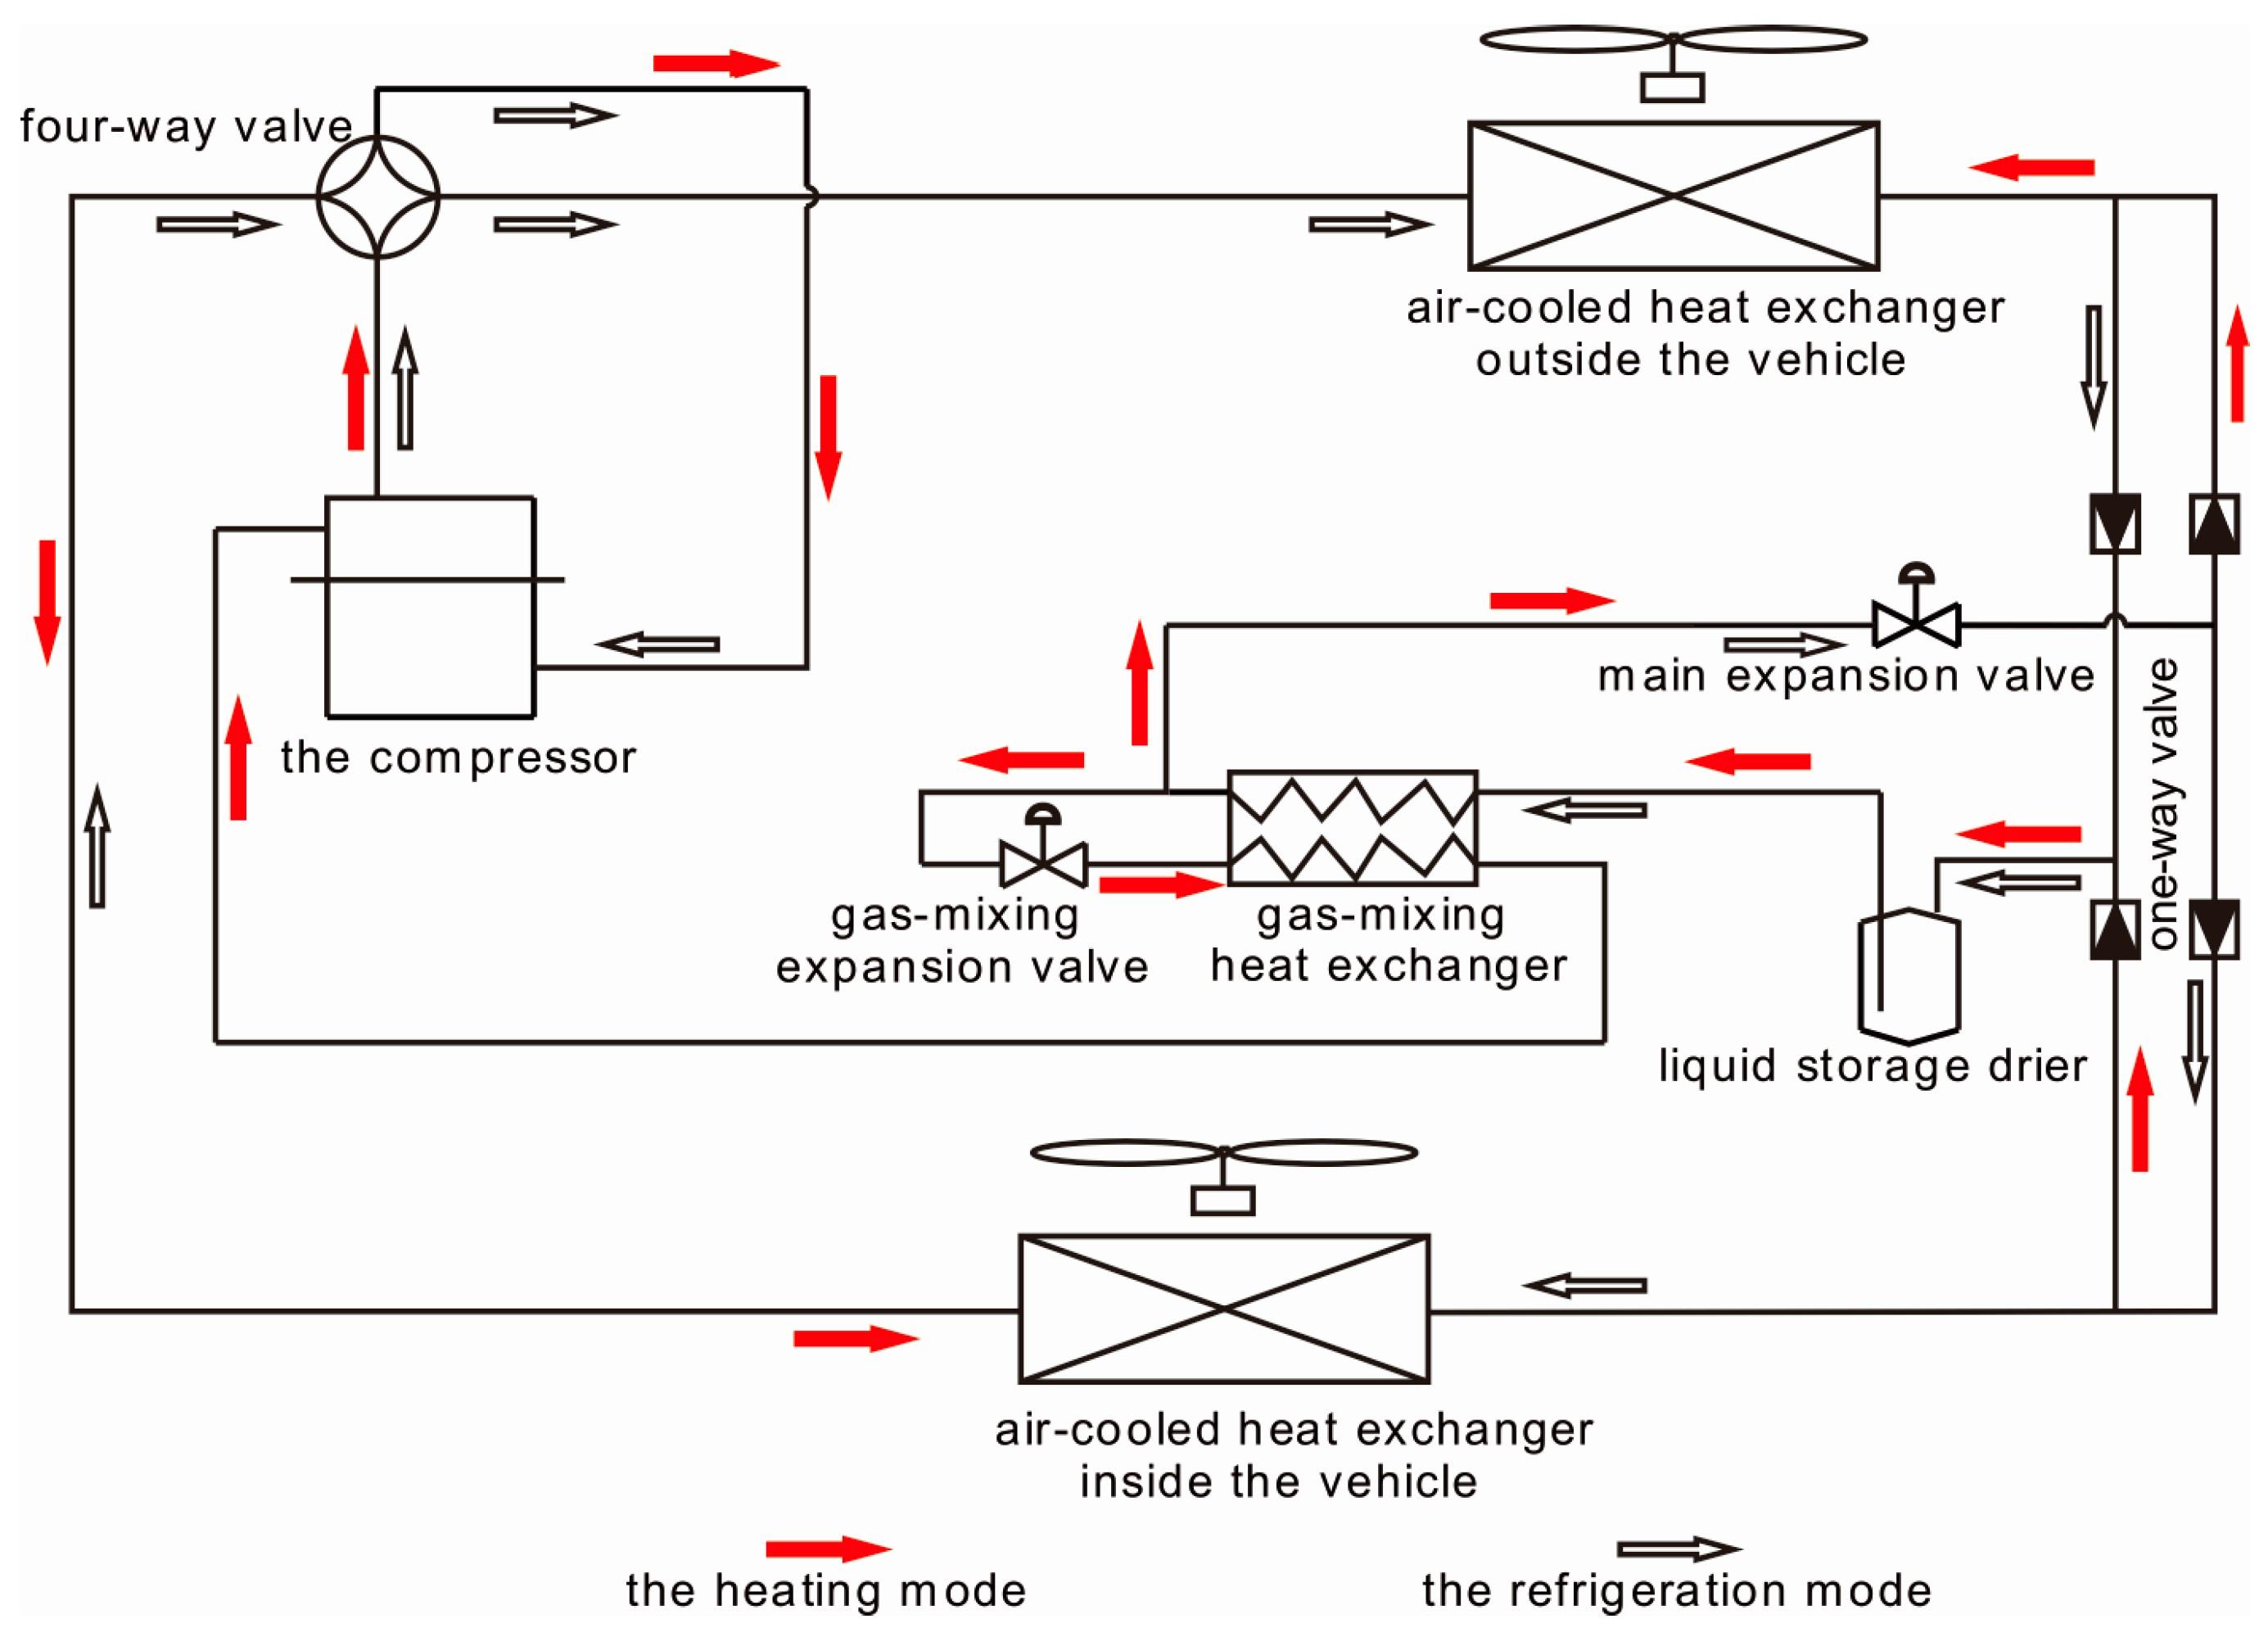 Auto Air Condition System Diagram Energies Free Full Text Of Auto Air Condition System Diagram